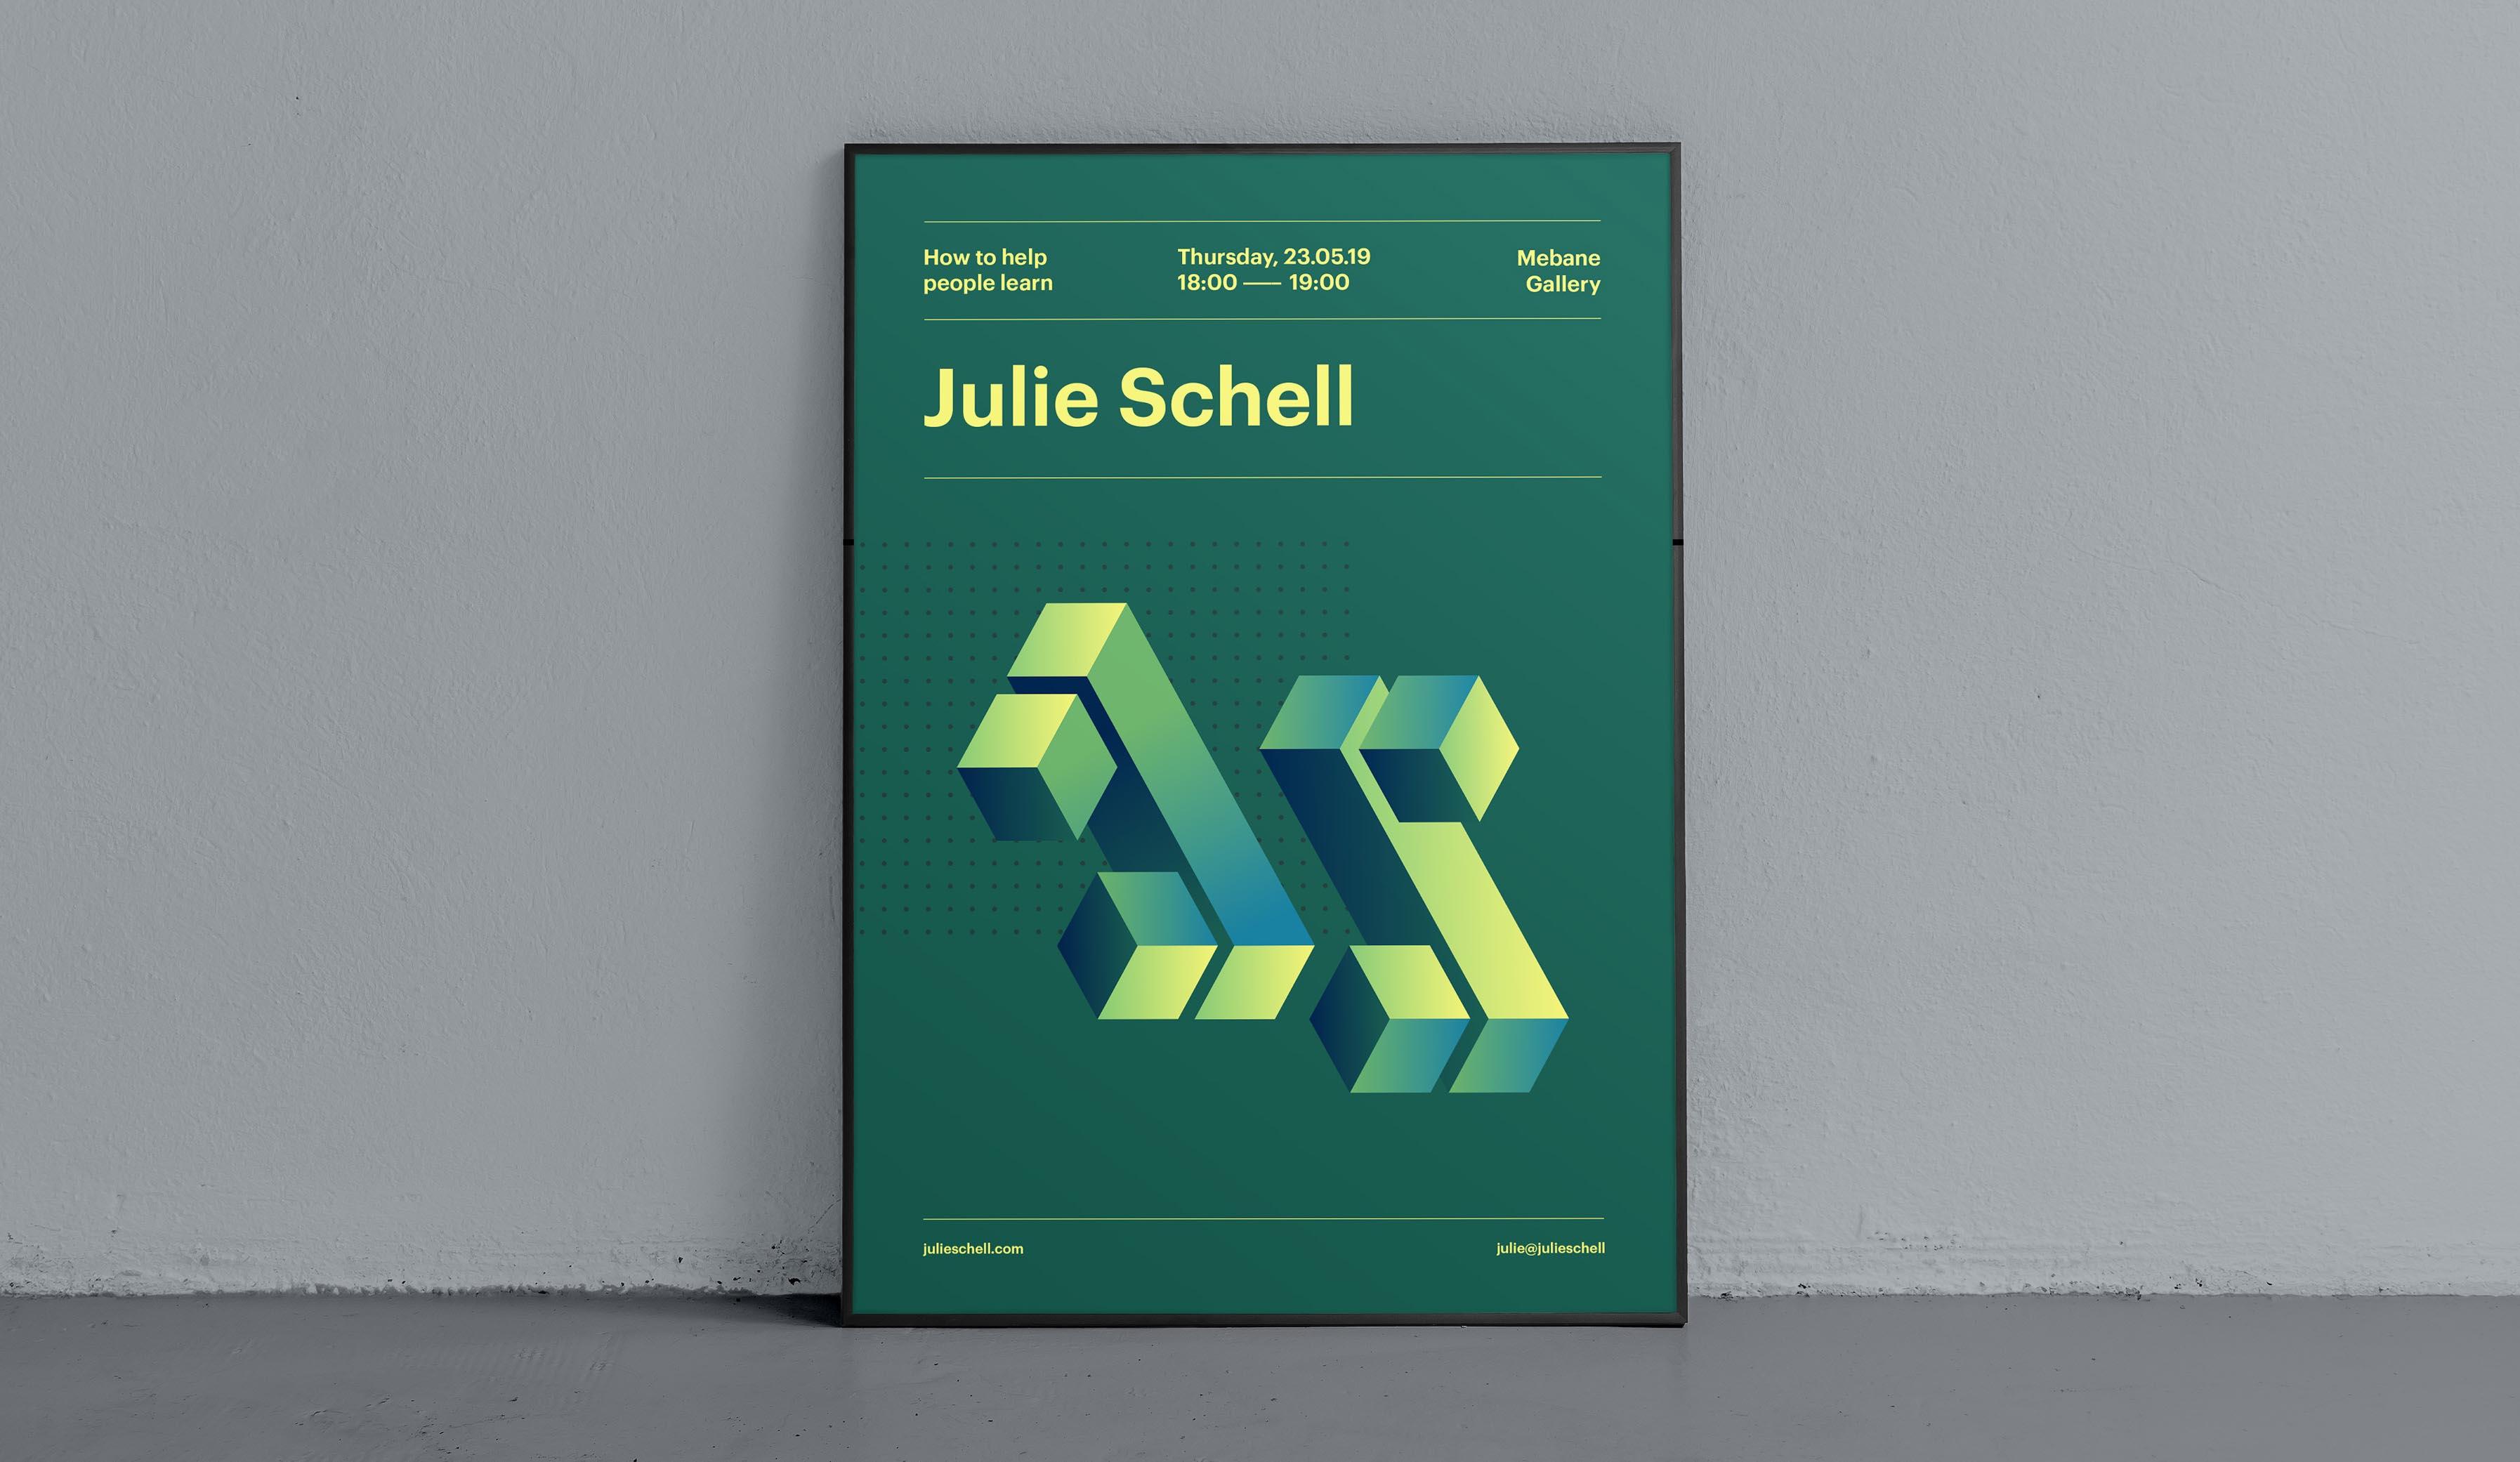 Julie Schell branding and website design